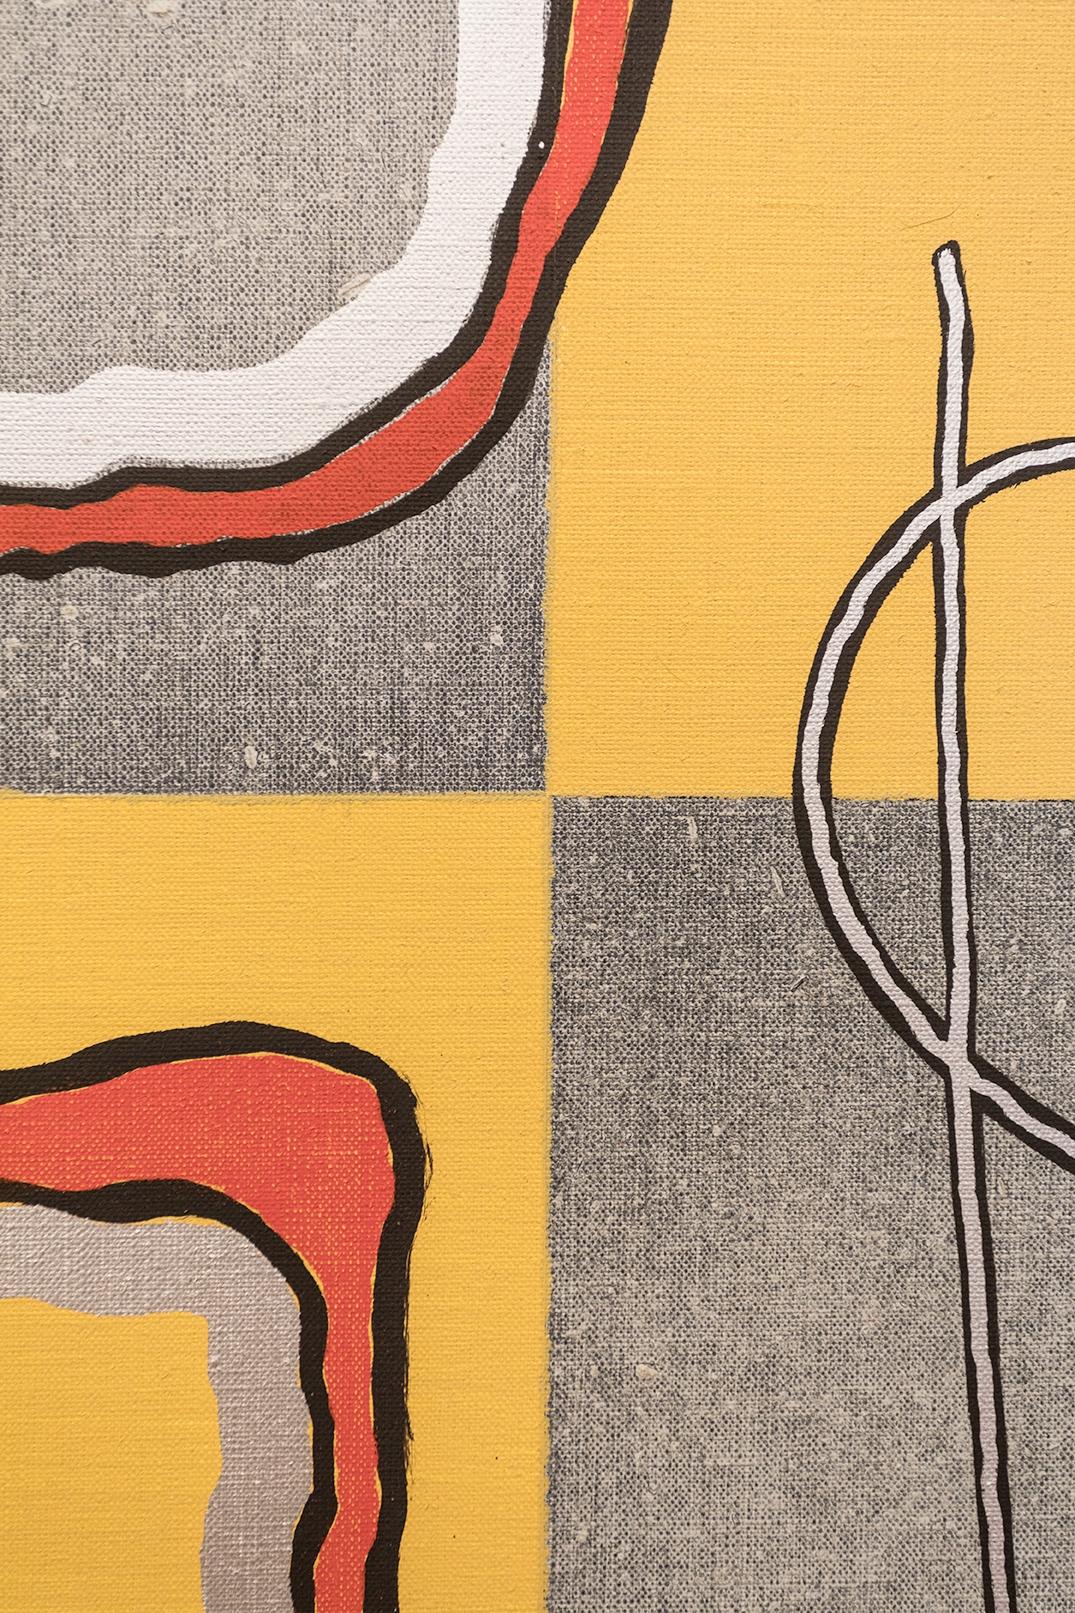 Joshua Abelow  Abelow in Luxury - detail 2016 Oil on linen 80 x 60 inches